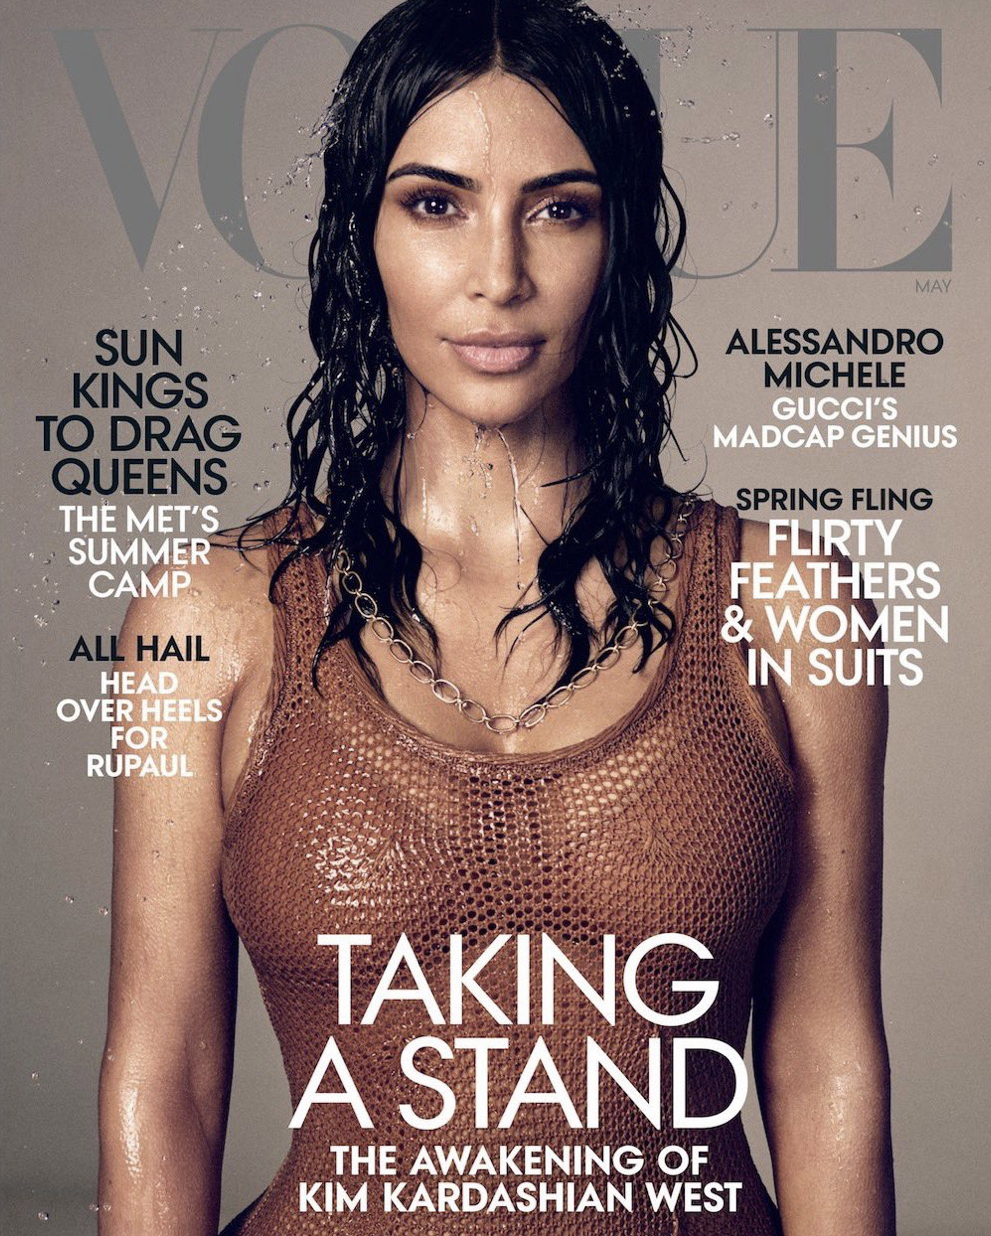 Kim Kardashian West Credit: @Vogue @MikaelJansson